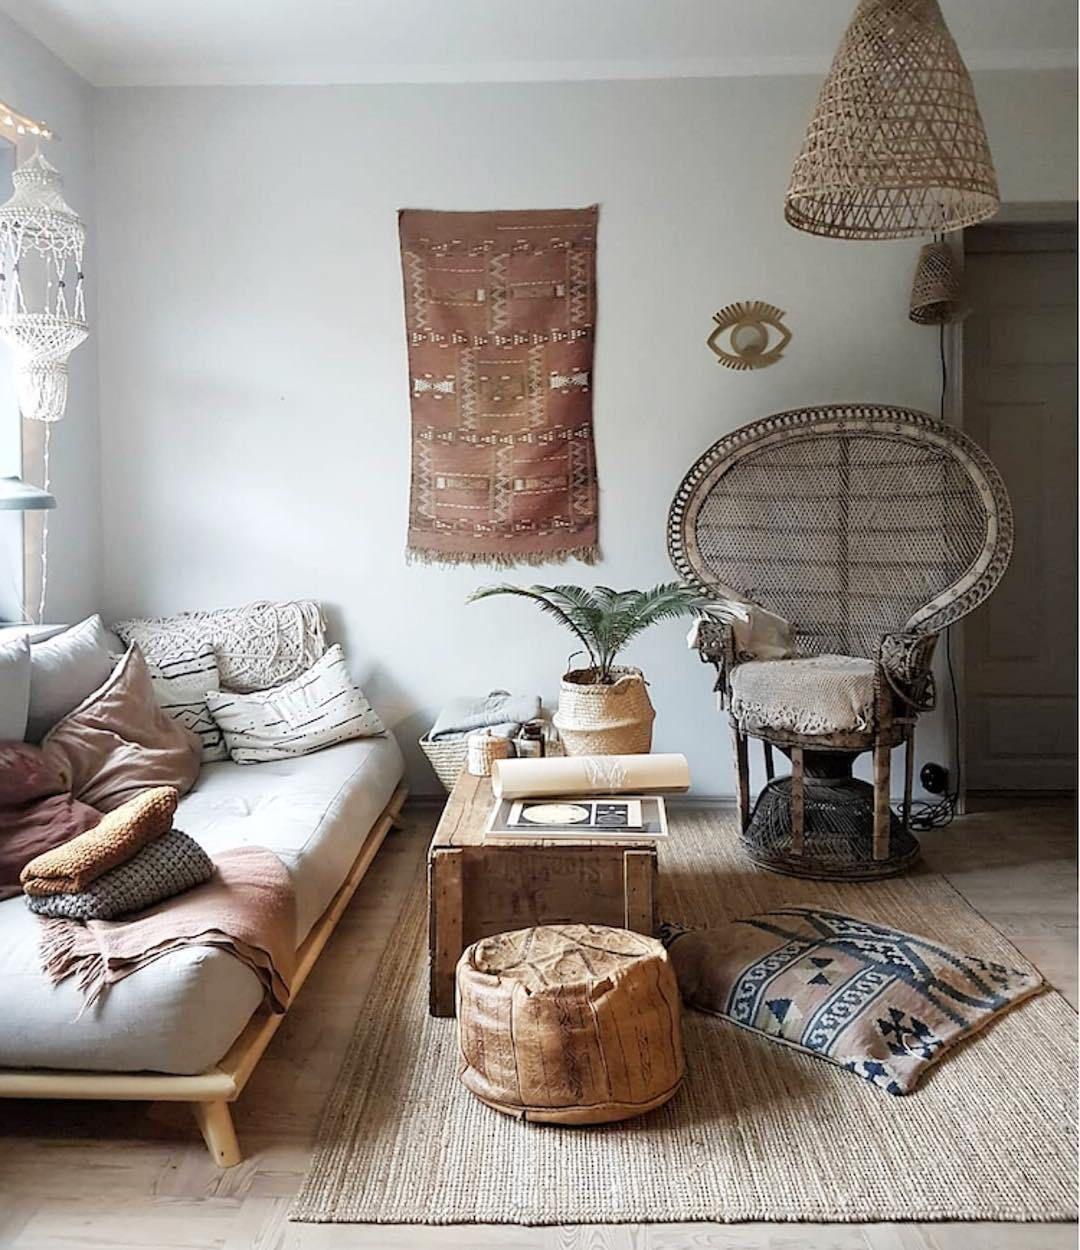 My Scandinavian Home A Blog Of Scandi Boho Inspiration La Casa De Freja Living Room Scandinavian Scandinavian Style Interior Interior Design Styles